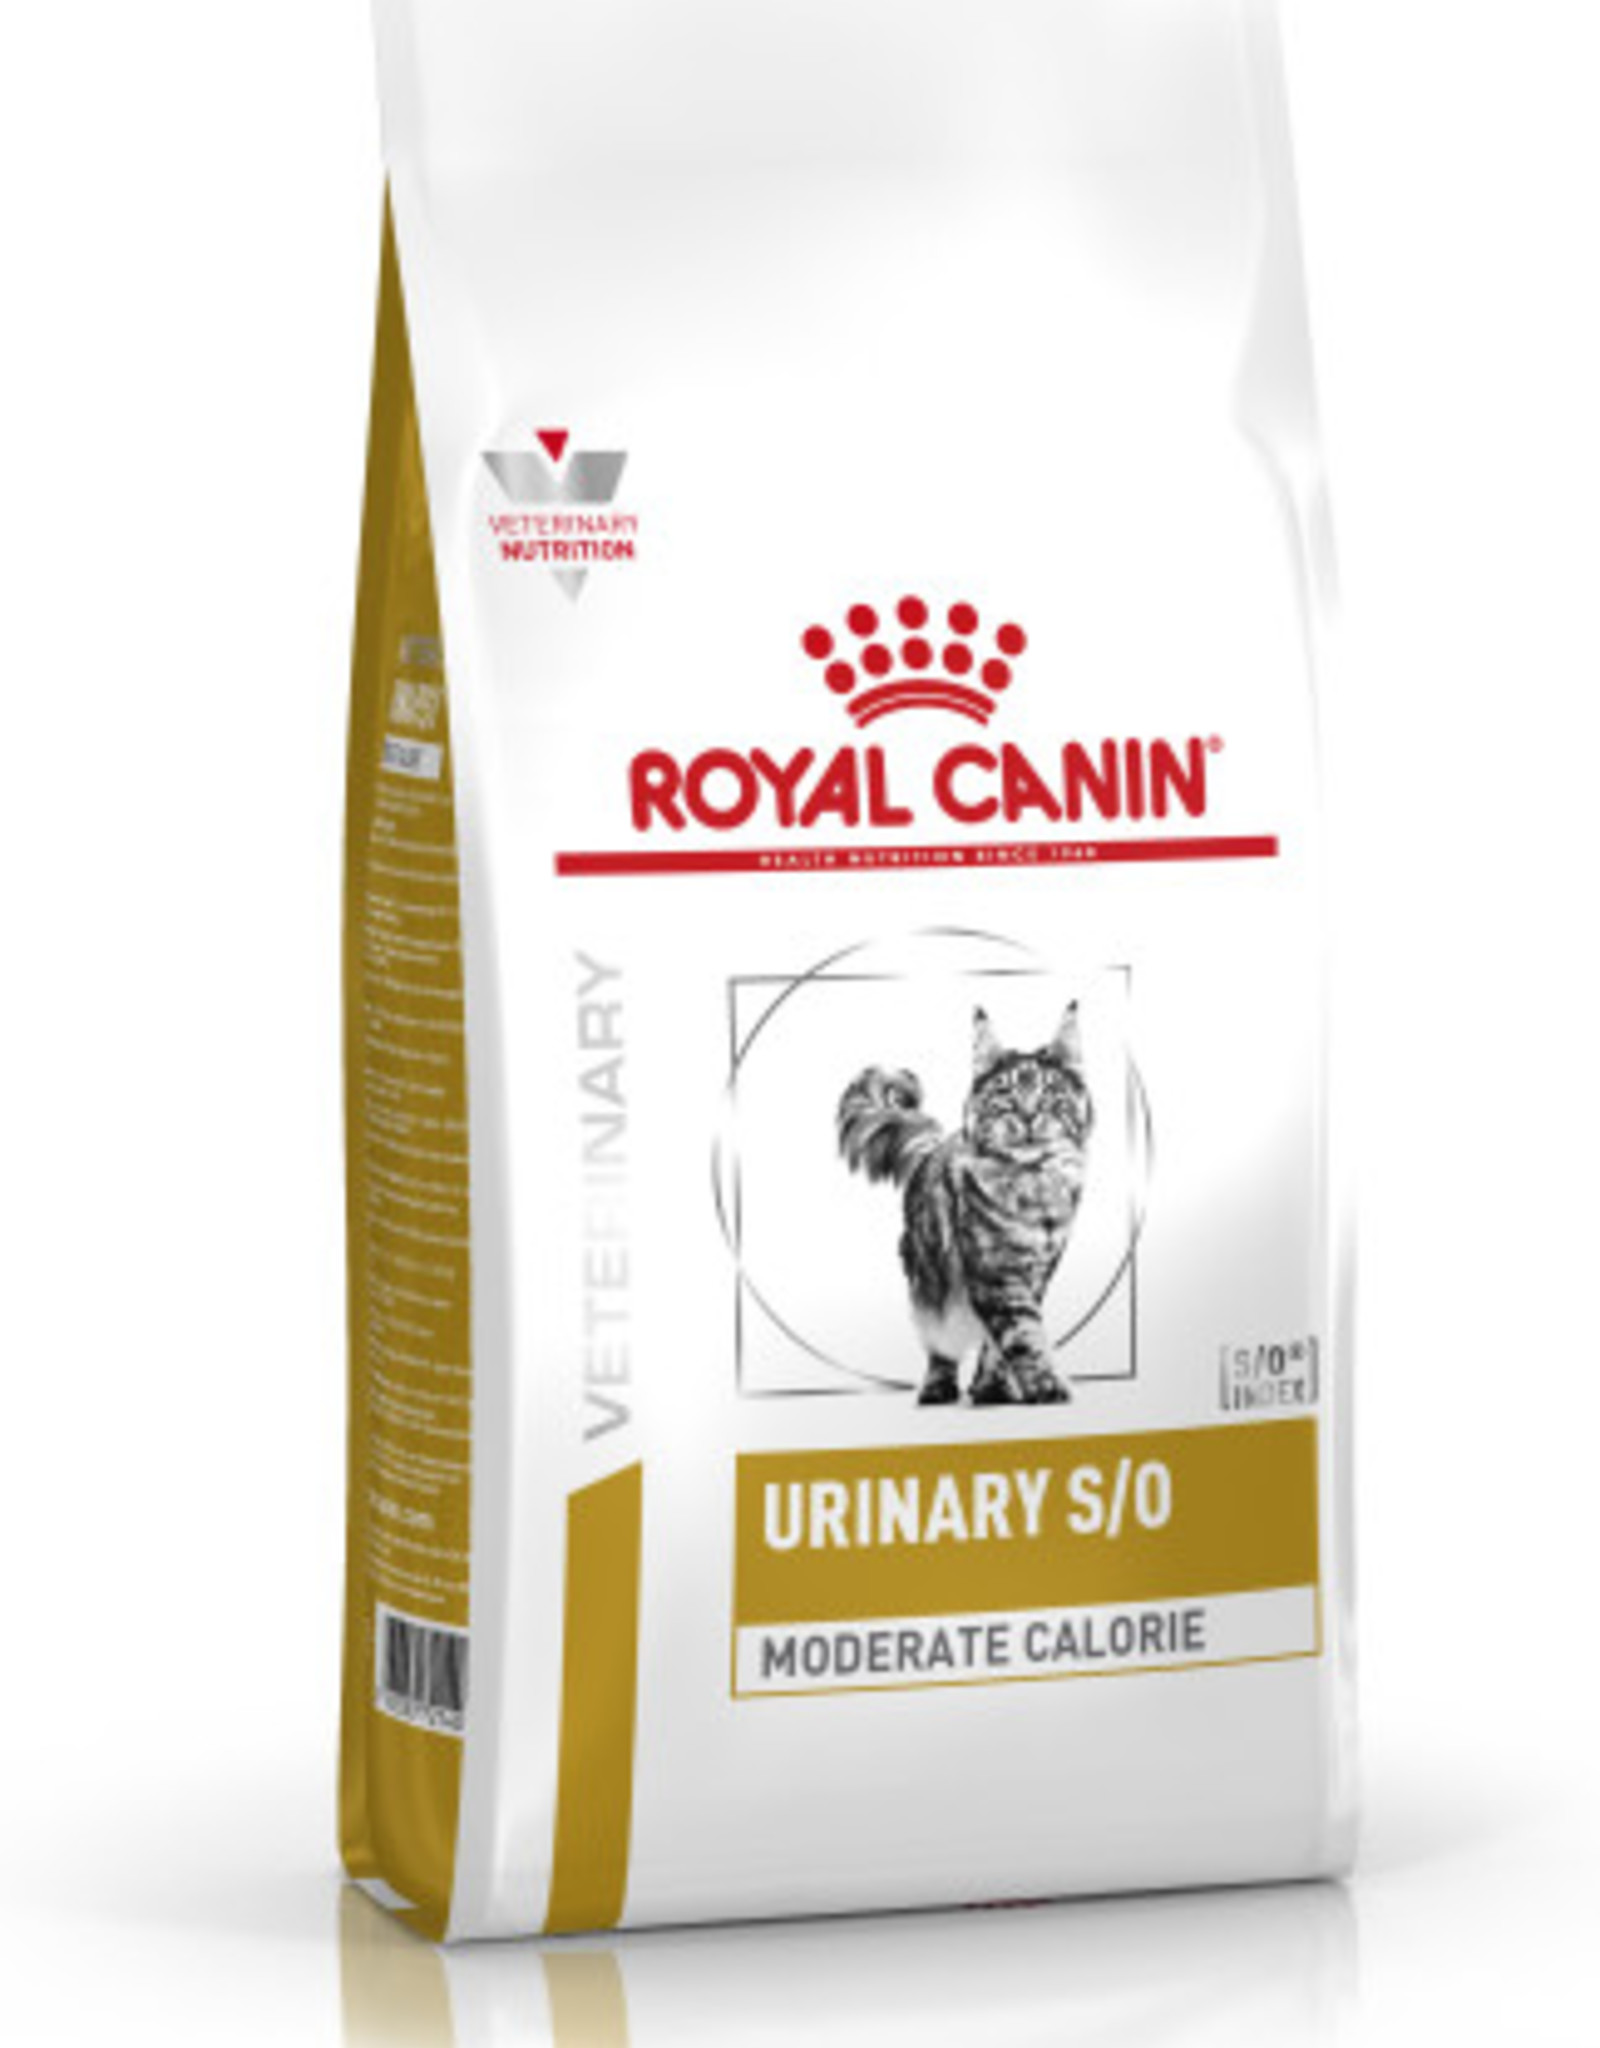 Royal Canin Royal Canin Urinary Moderate Calorie Katze 7kg